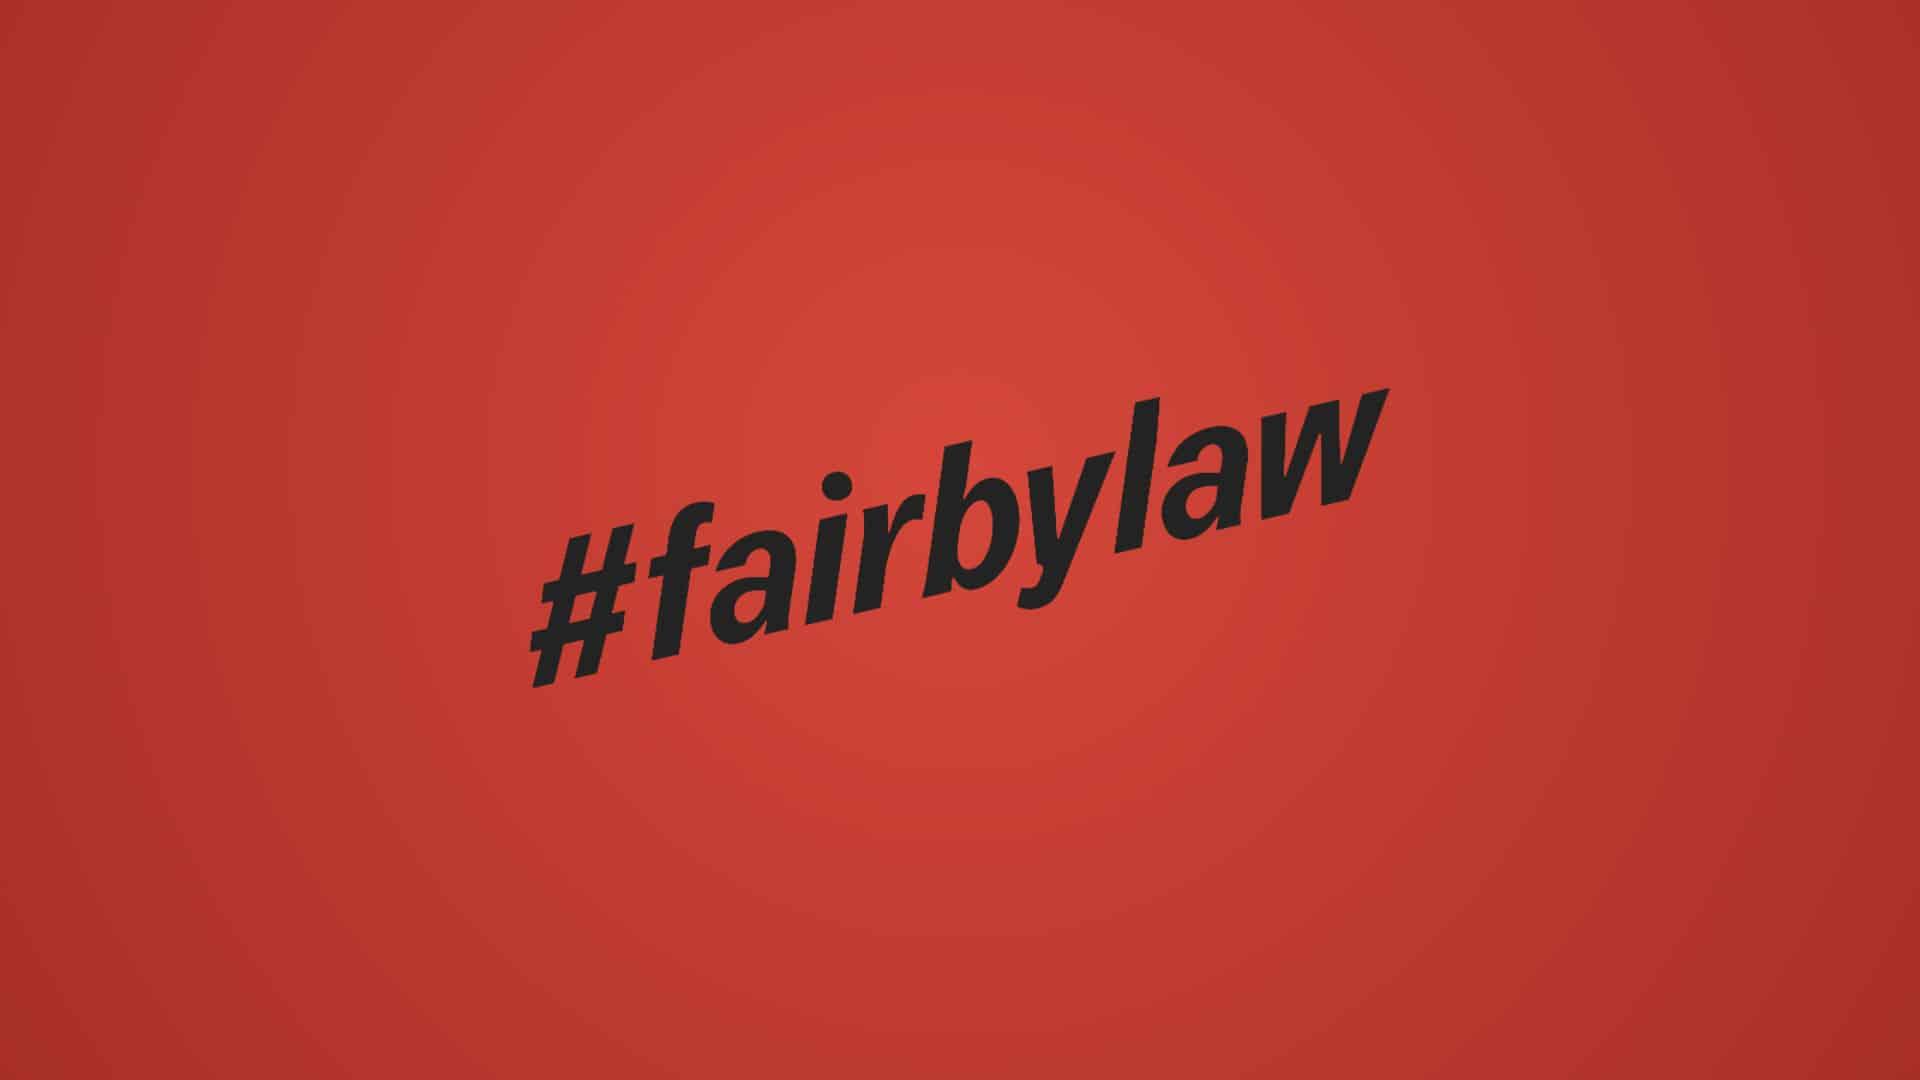 fairbylaw